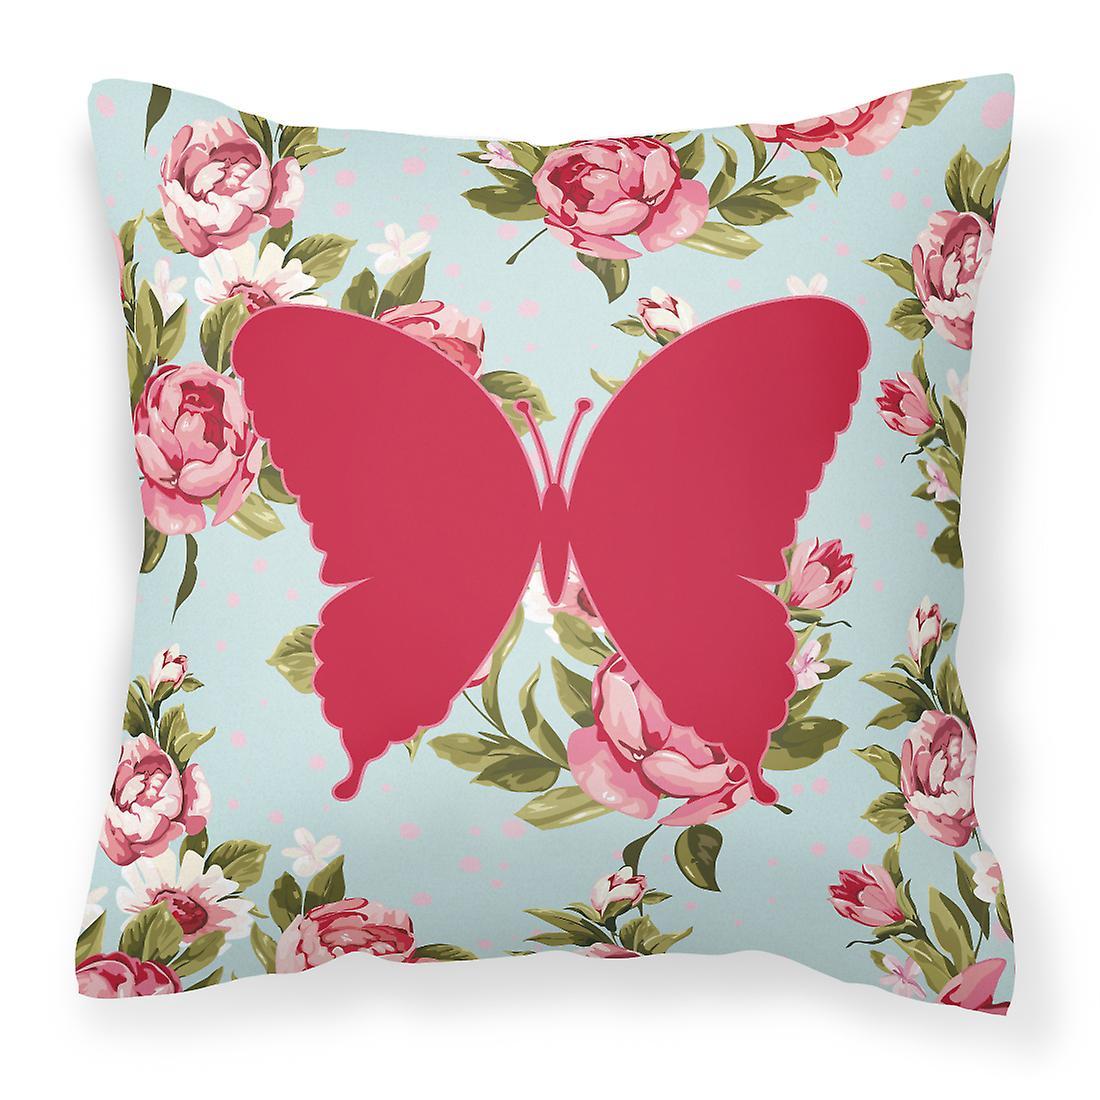 Décoratif Roses Oreiller Bleu Toile Bb1048 Tissu Minable Papillons Chic drhQts